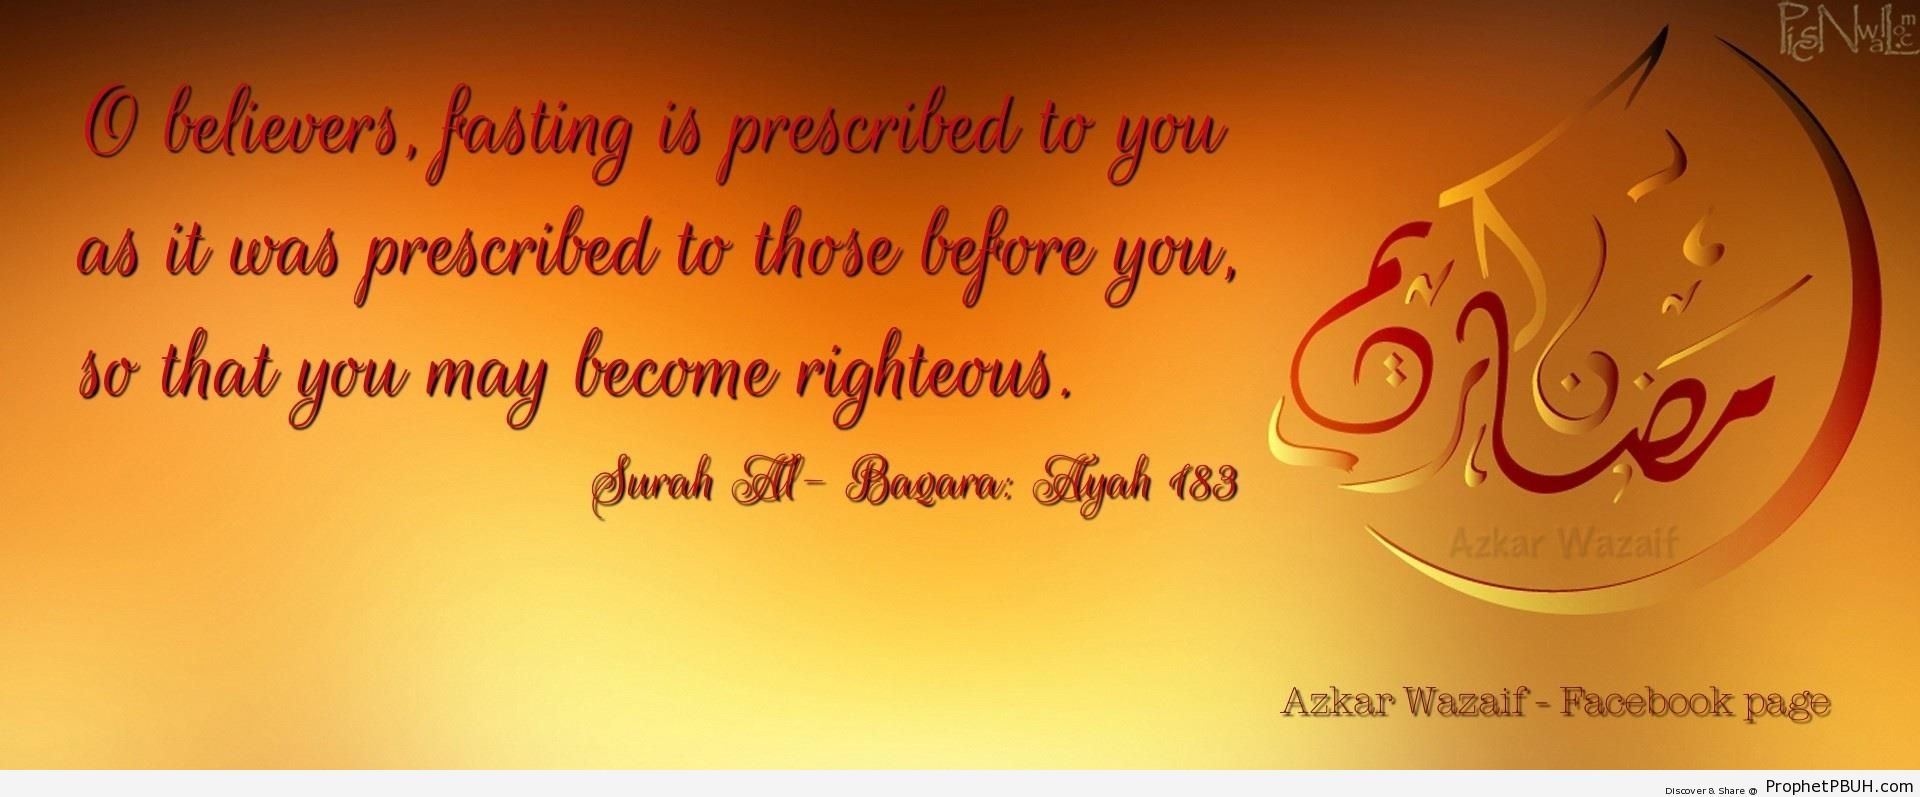 Ramadan - Islamic Quotes -002